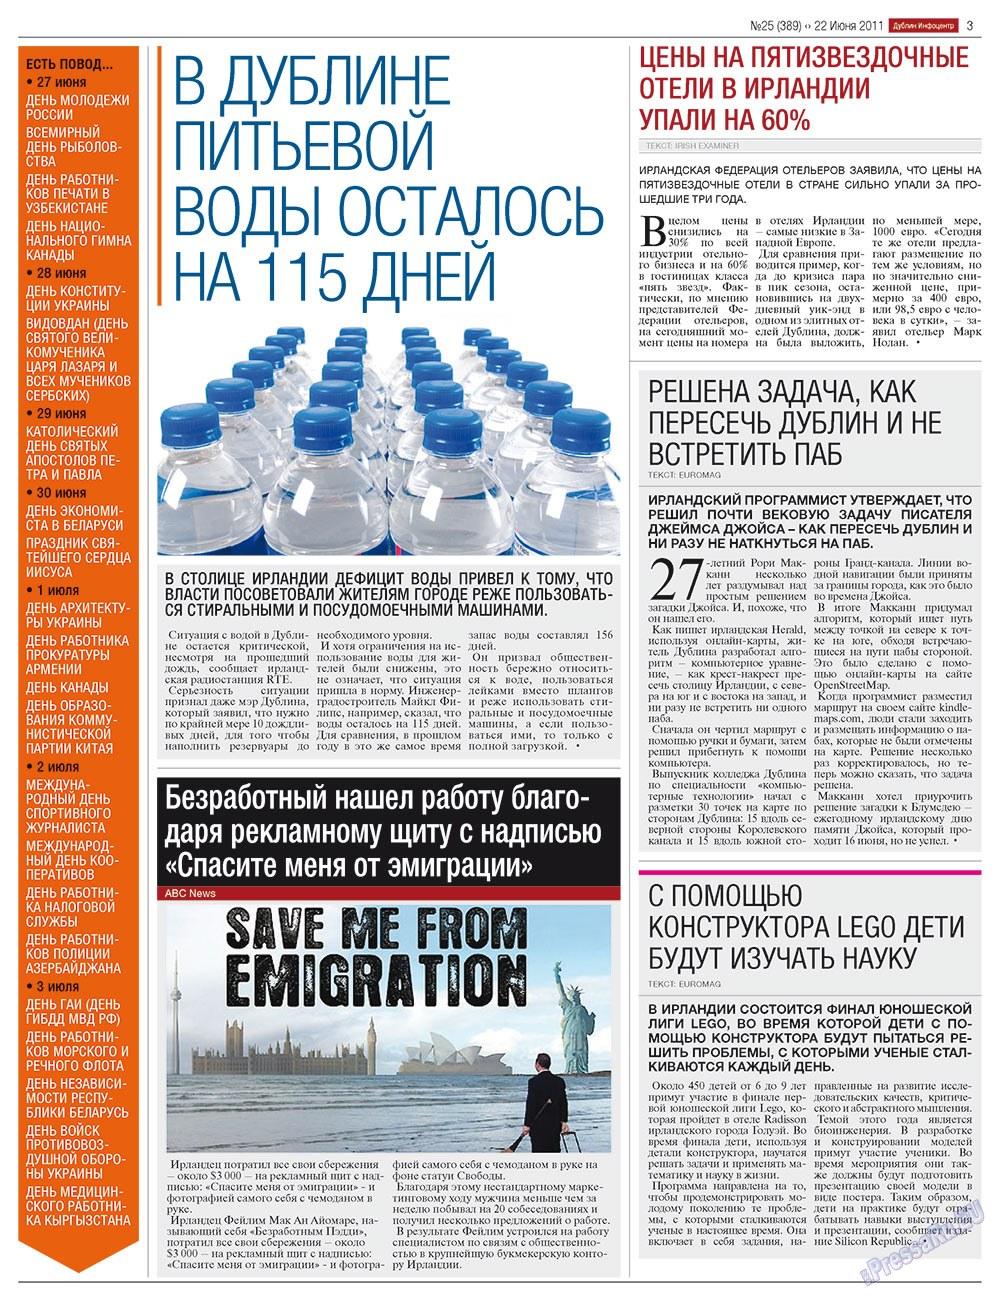 Дублин инфоцентр (газета). 2011 год, номер 25, стр. 3